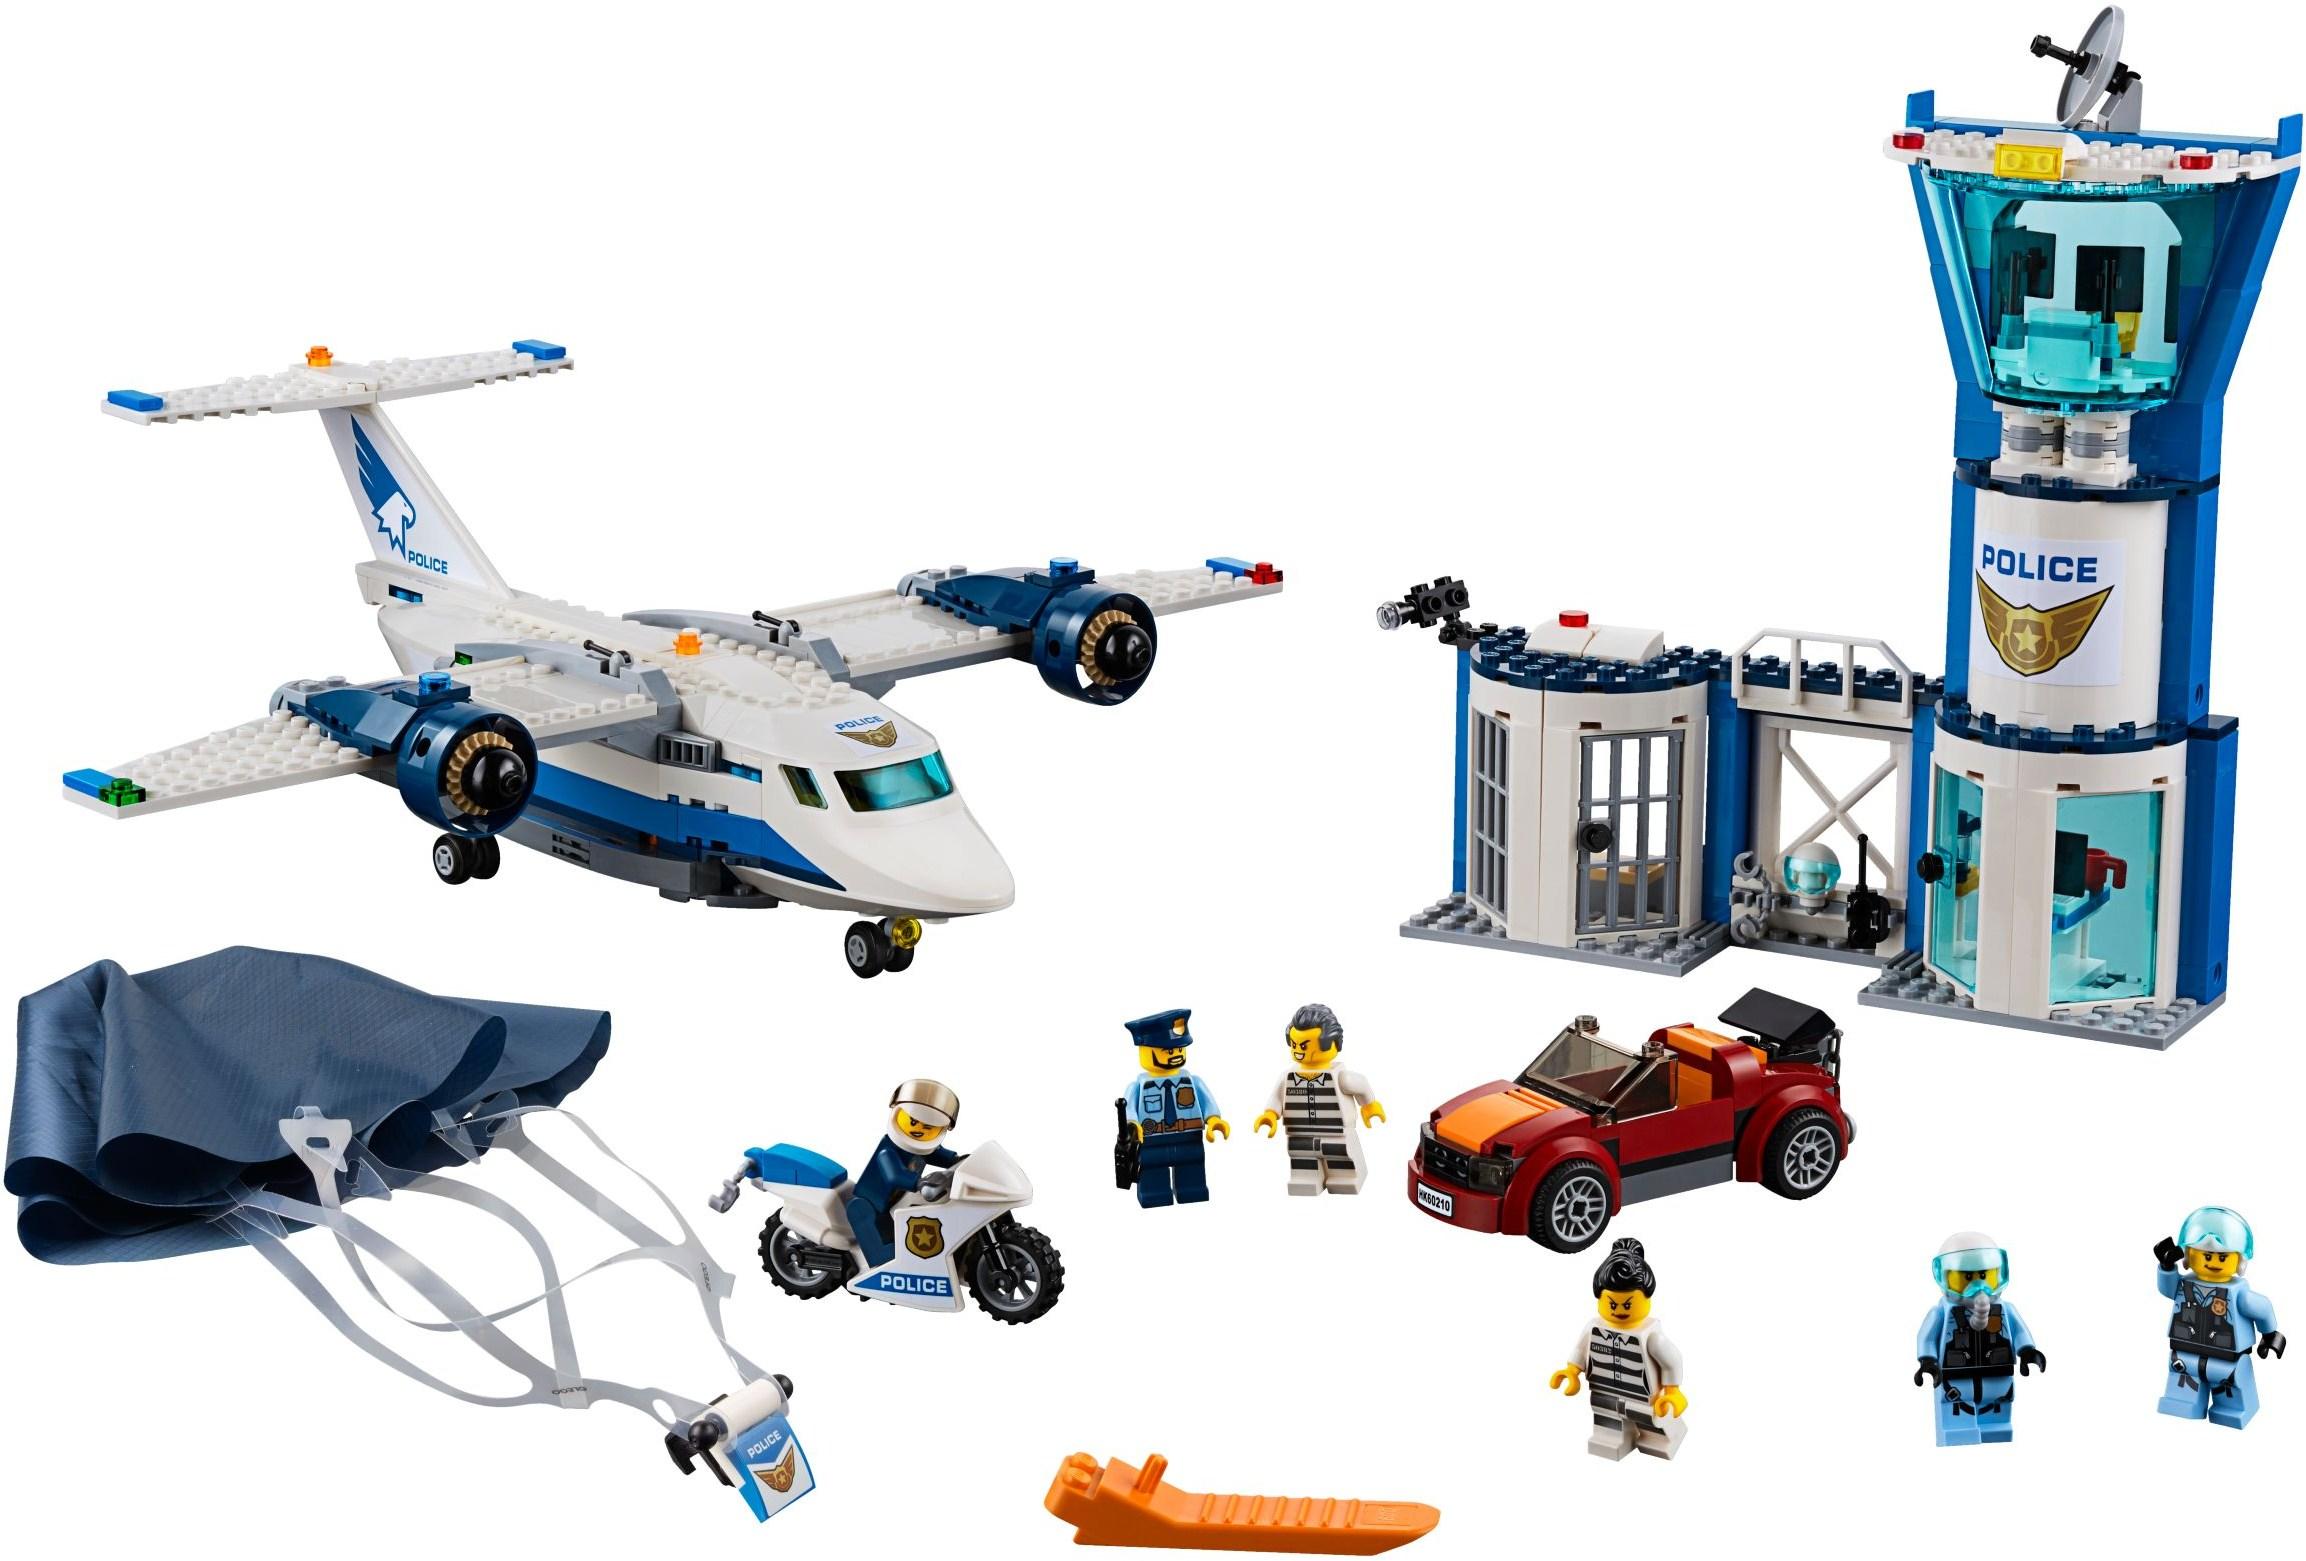 LEGO Real Life Heroes air base